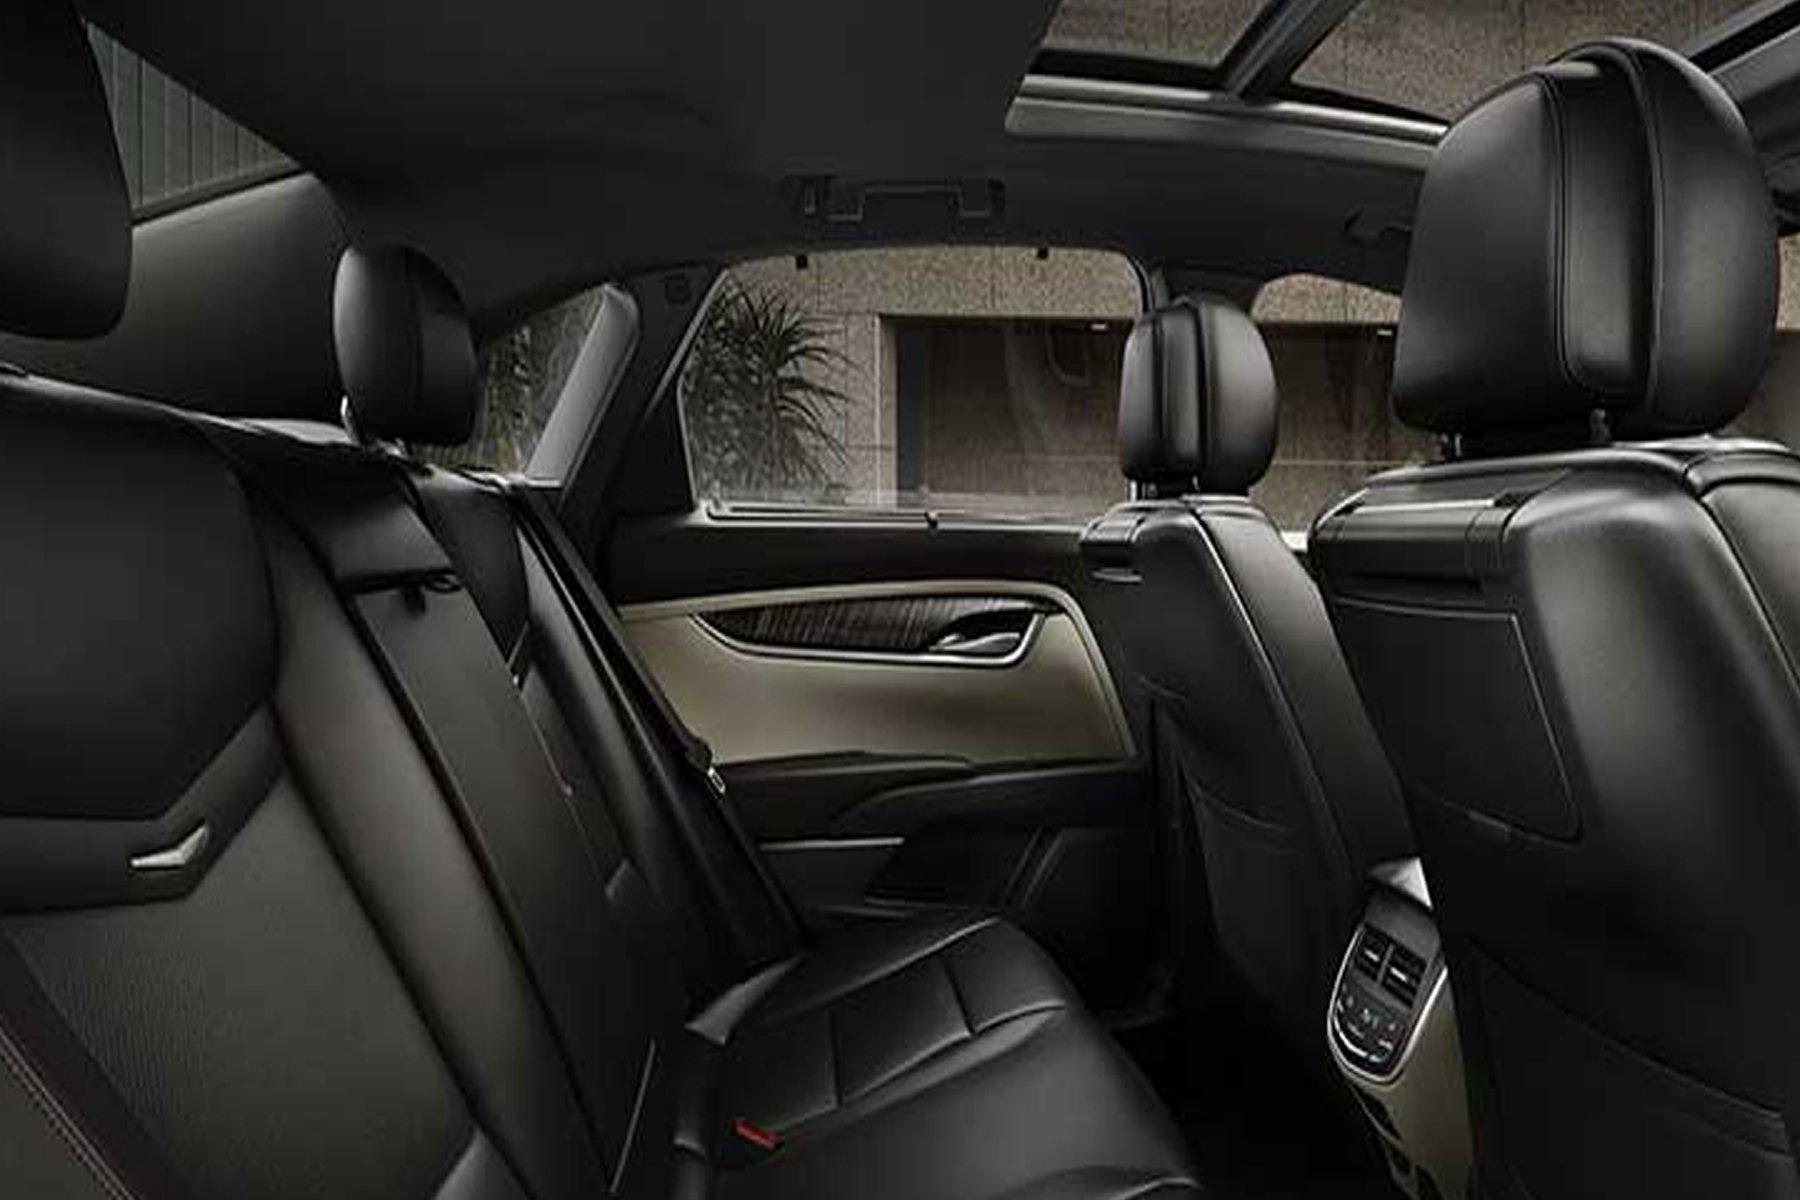 Skyline Chicago Limo Cars Luxury Fleet Black Cadillac XTS Interior October 2020